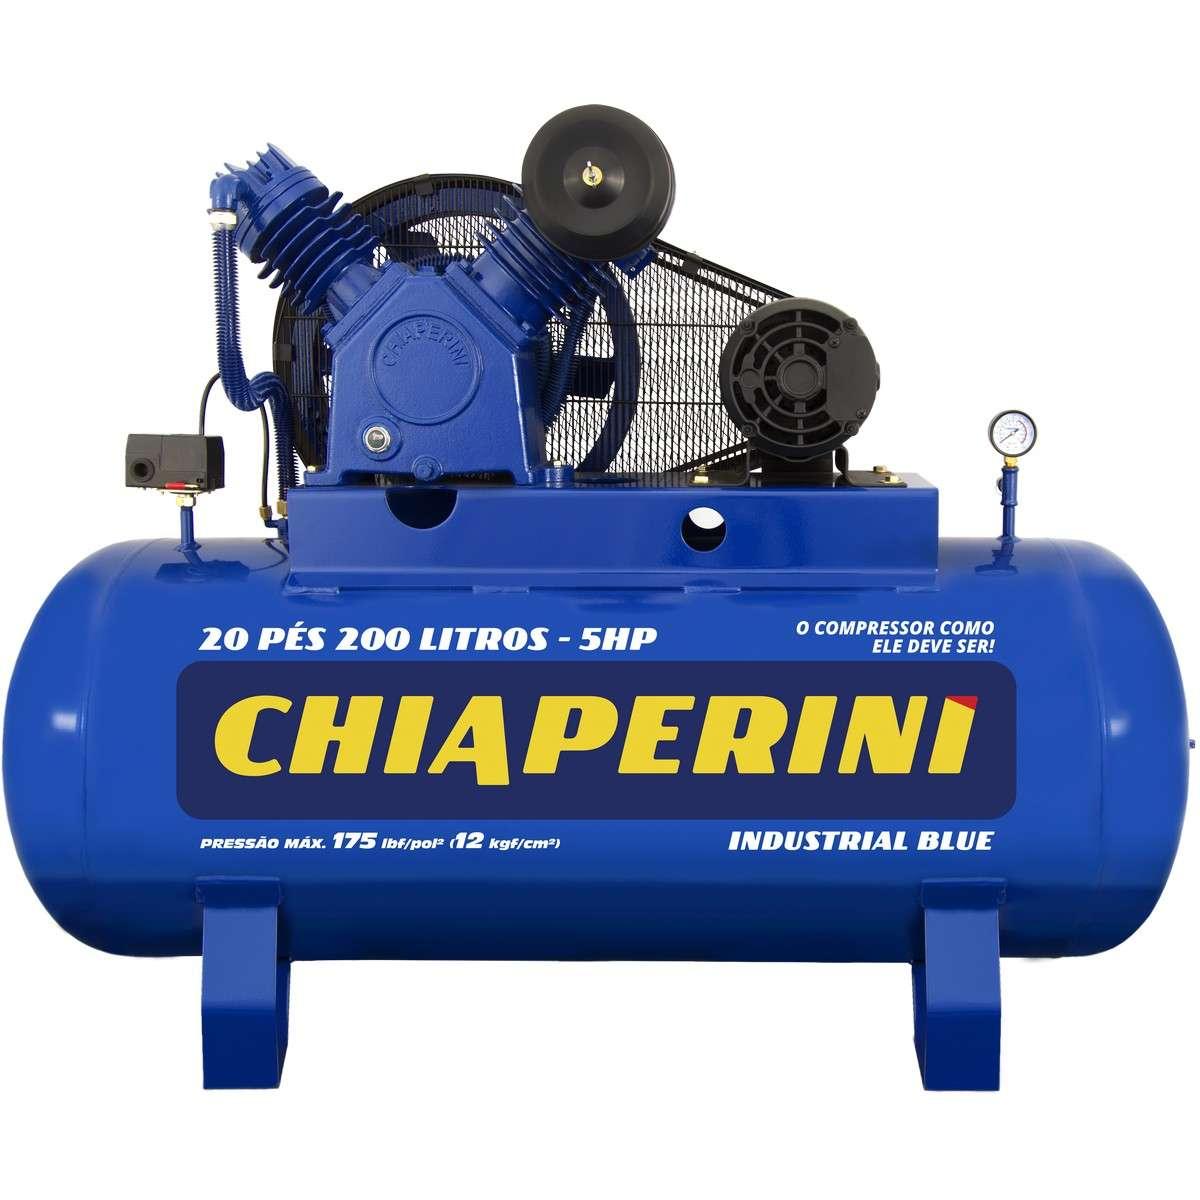 Compressor De Ar Chiaperini 20 Pcm (pés) 200 Litros Blue